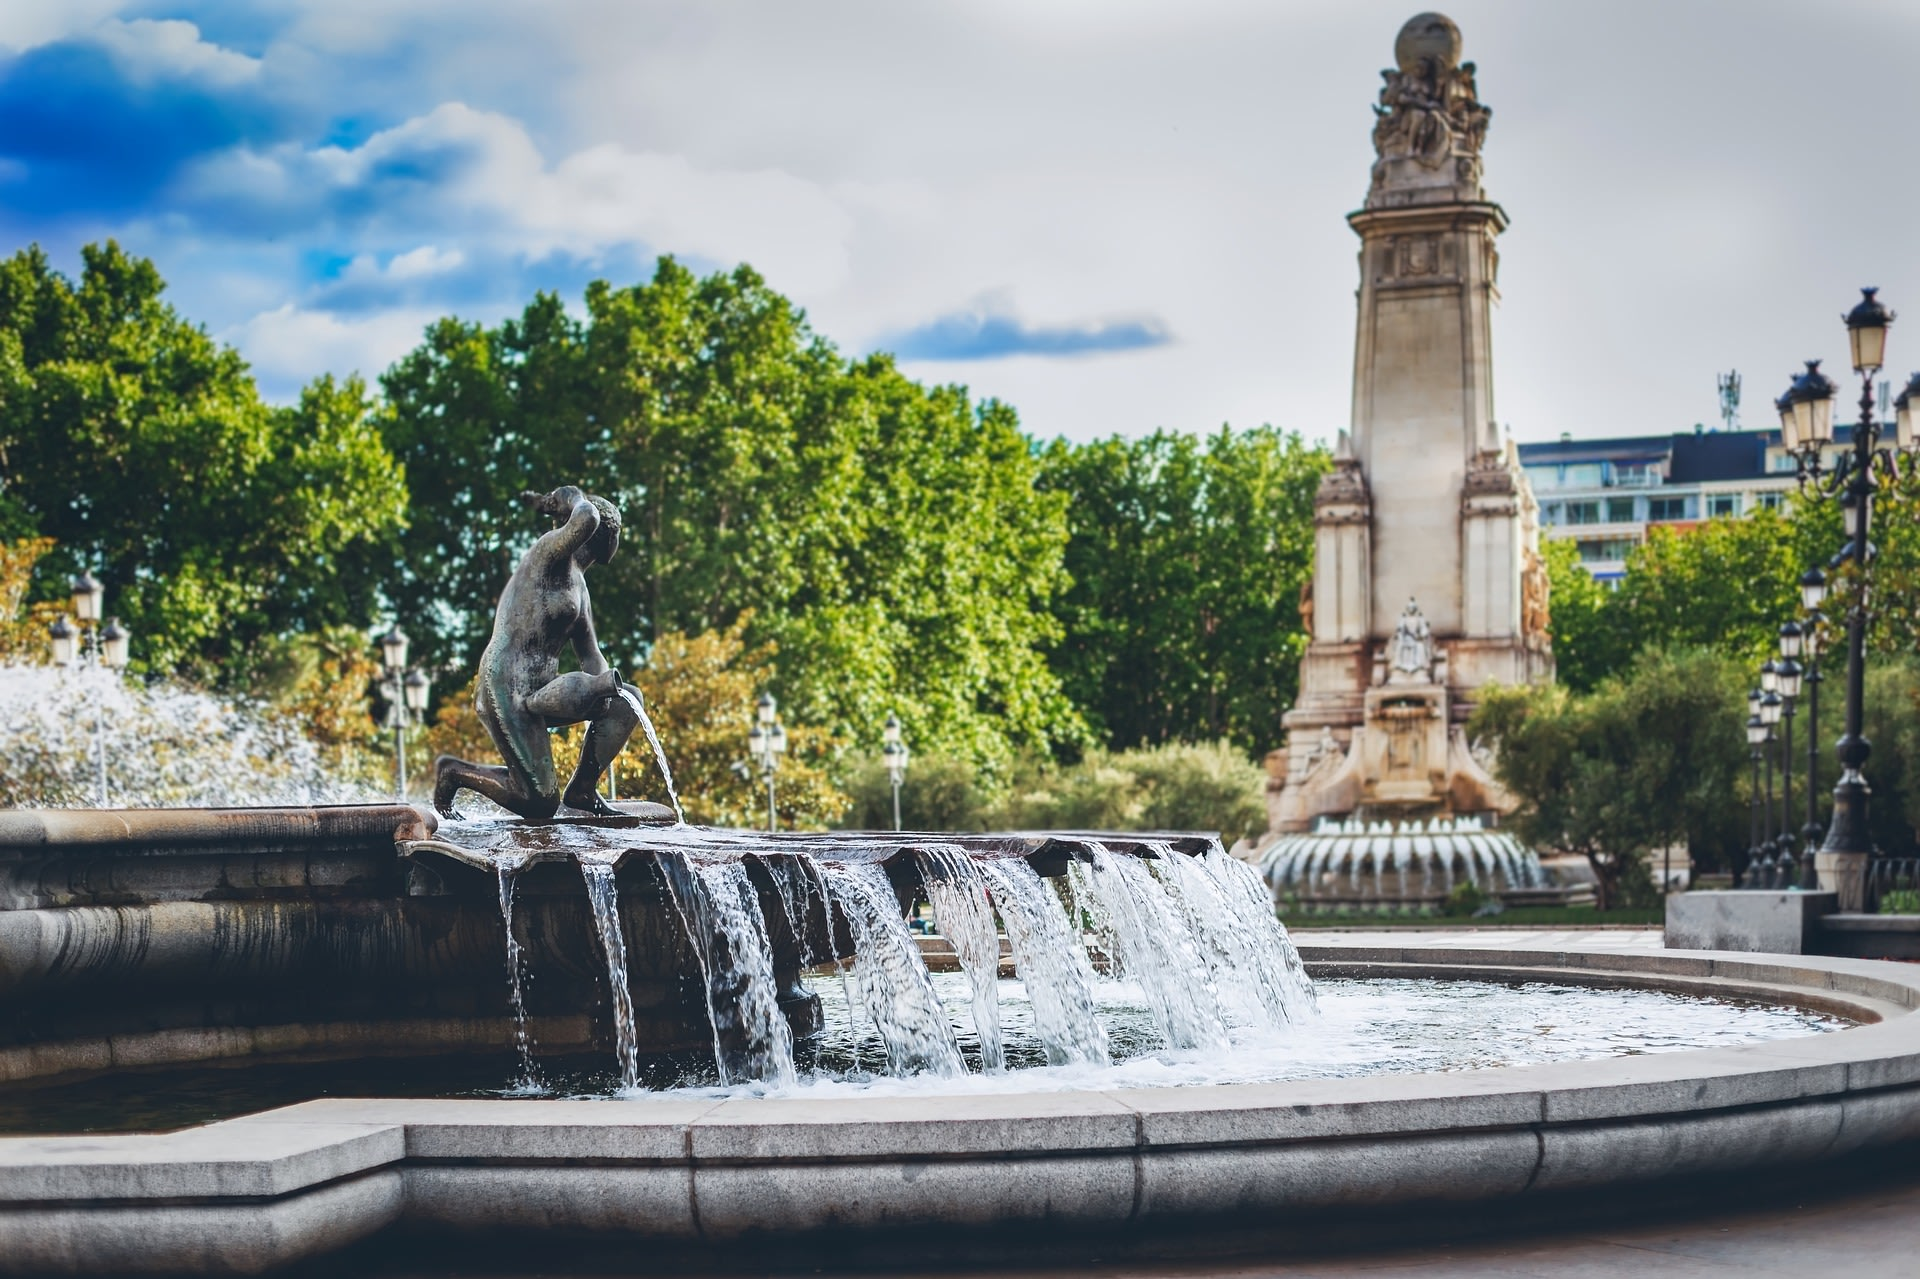 Palau Nacional and Magical Fountains